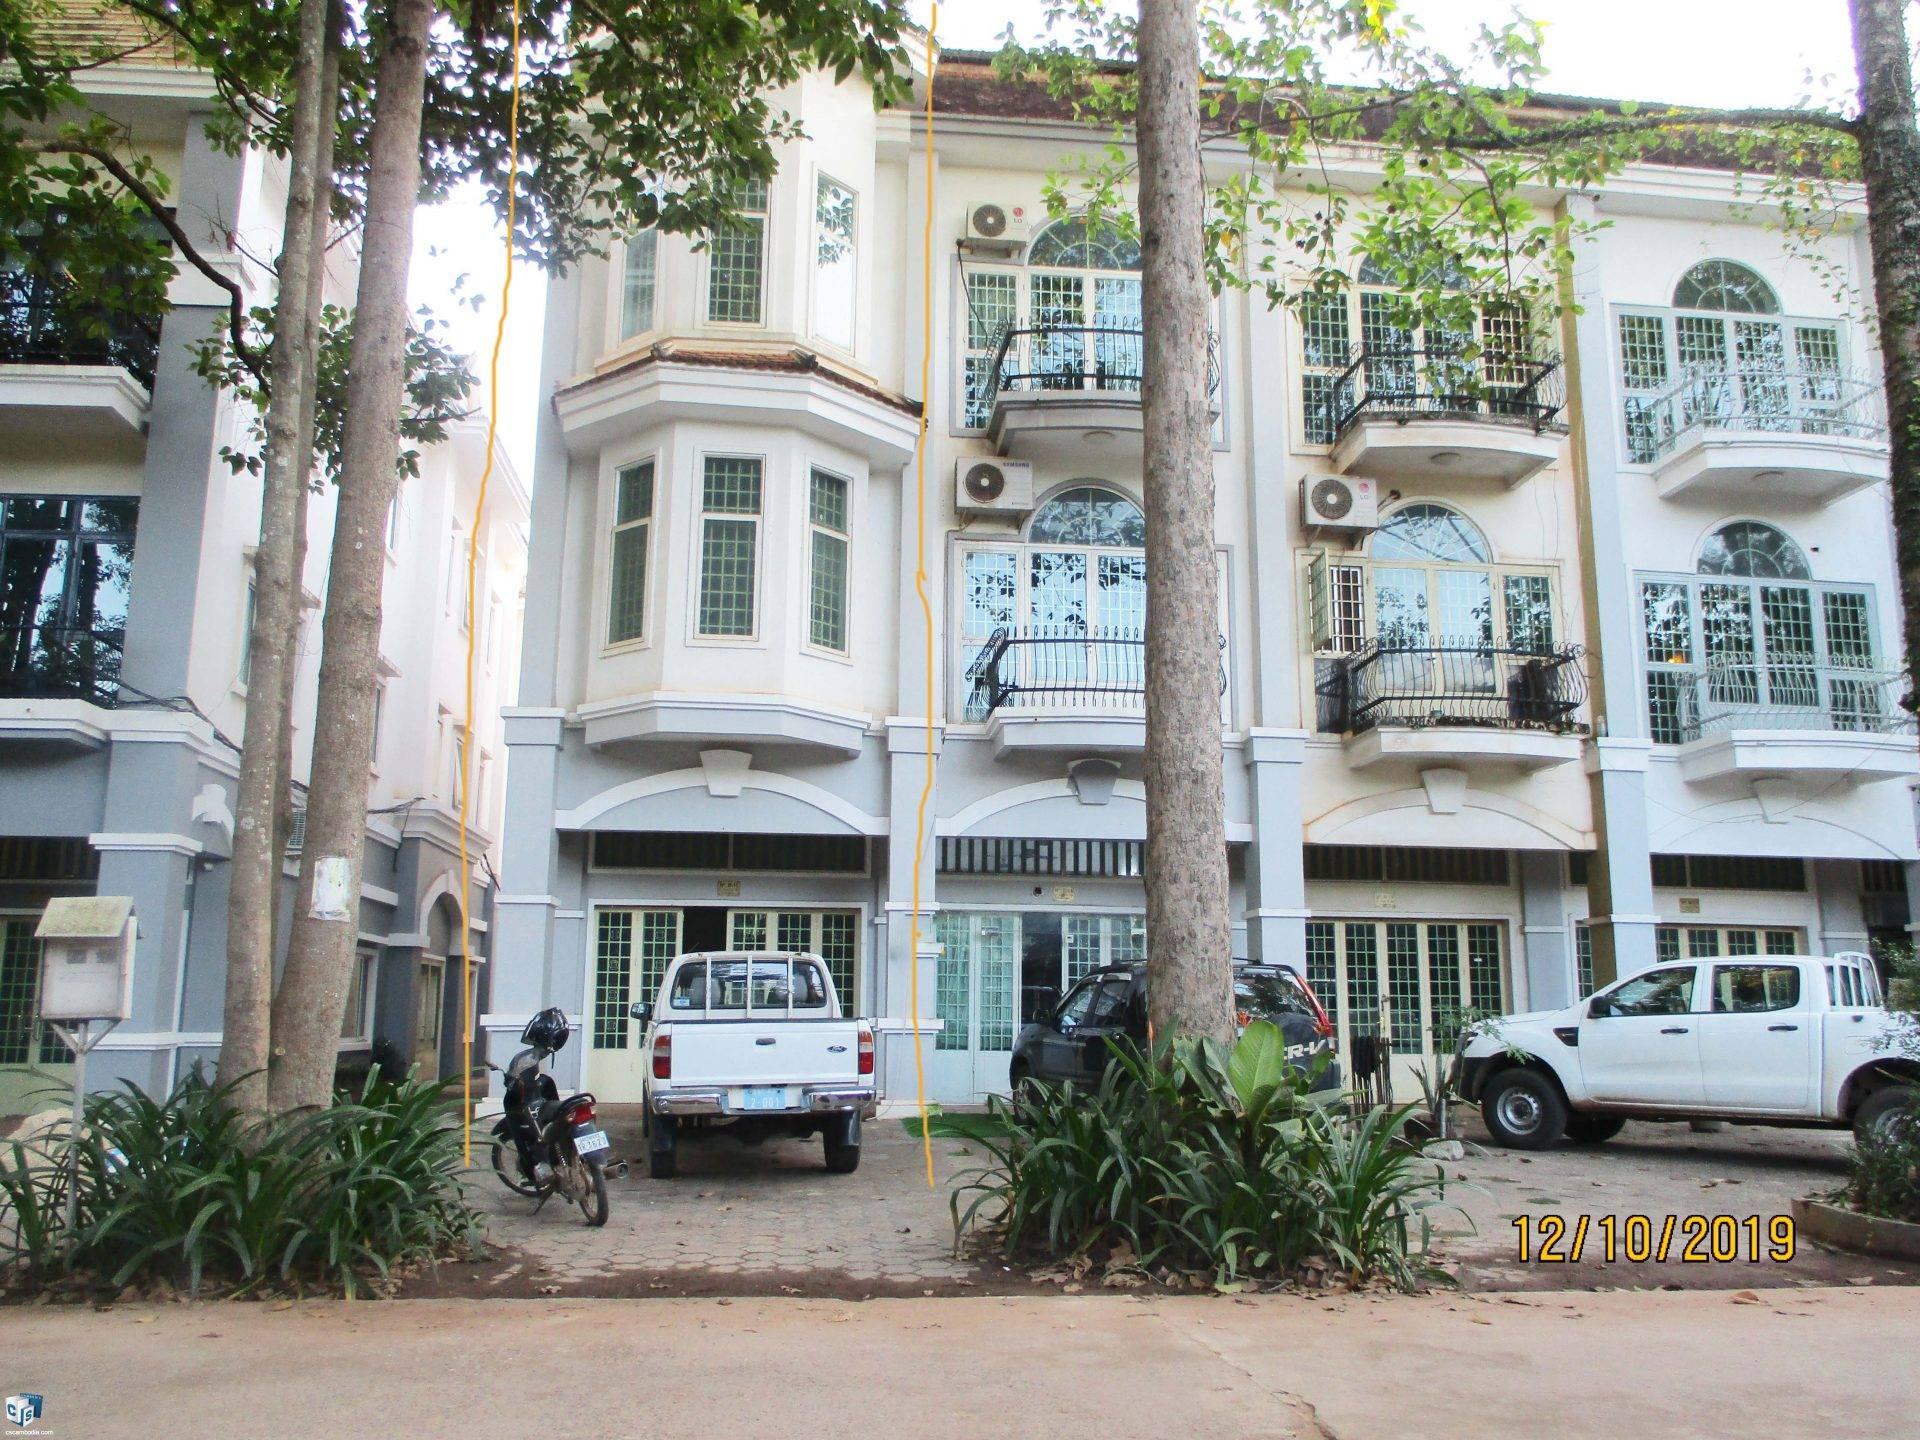 4 Bedroom House – For Sale – Kok Chork Commune – Siem Reap